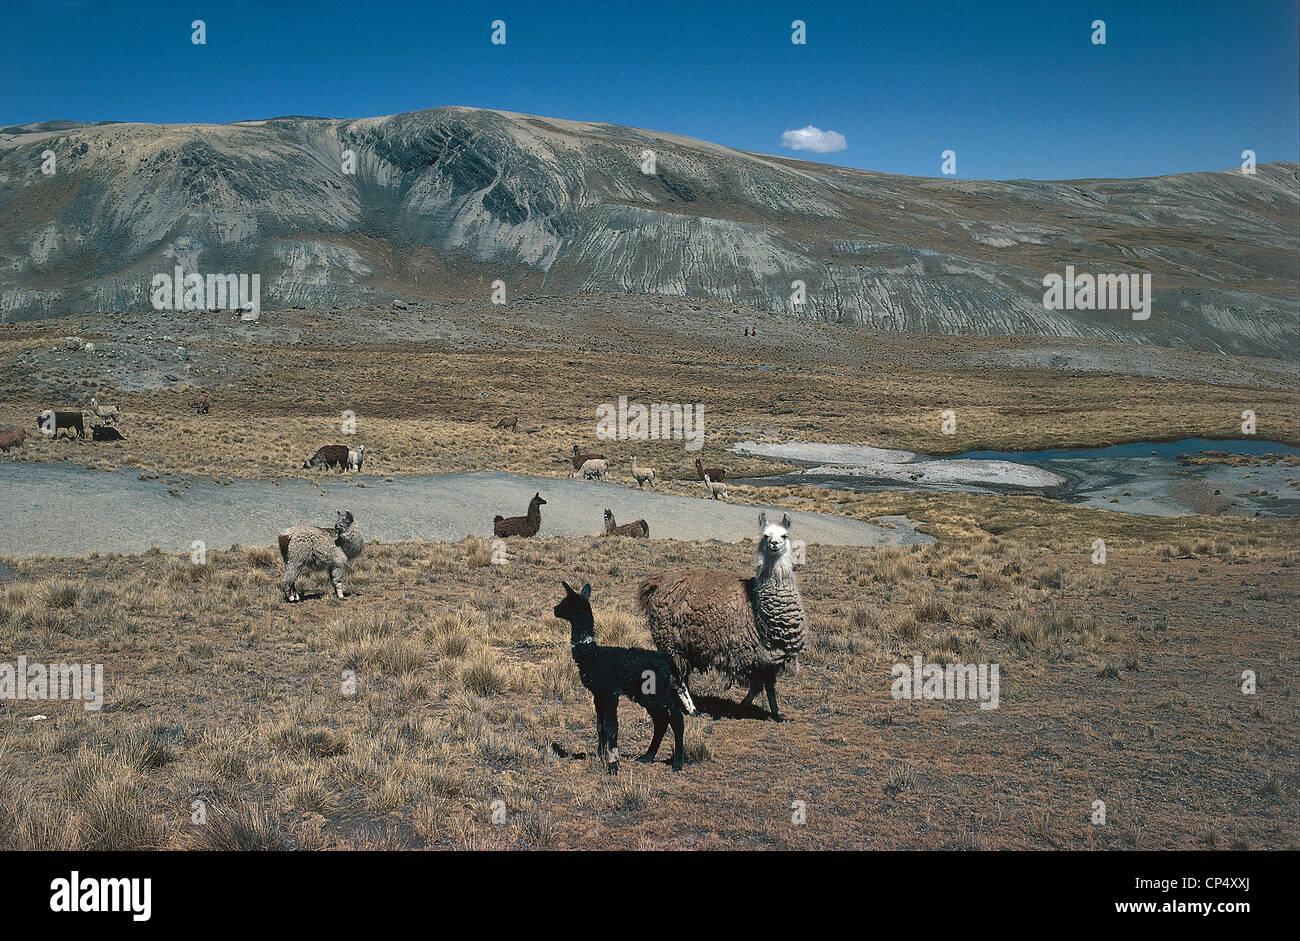 Peru - the Andes - Cordillera Real. Group of llamas (Lama glama) and alpaca (Vicugna pacos) in the pasture. - Stock Image